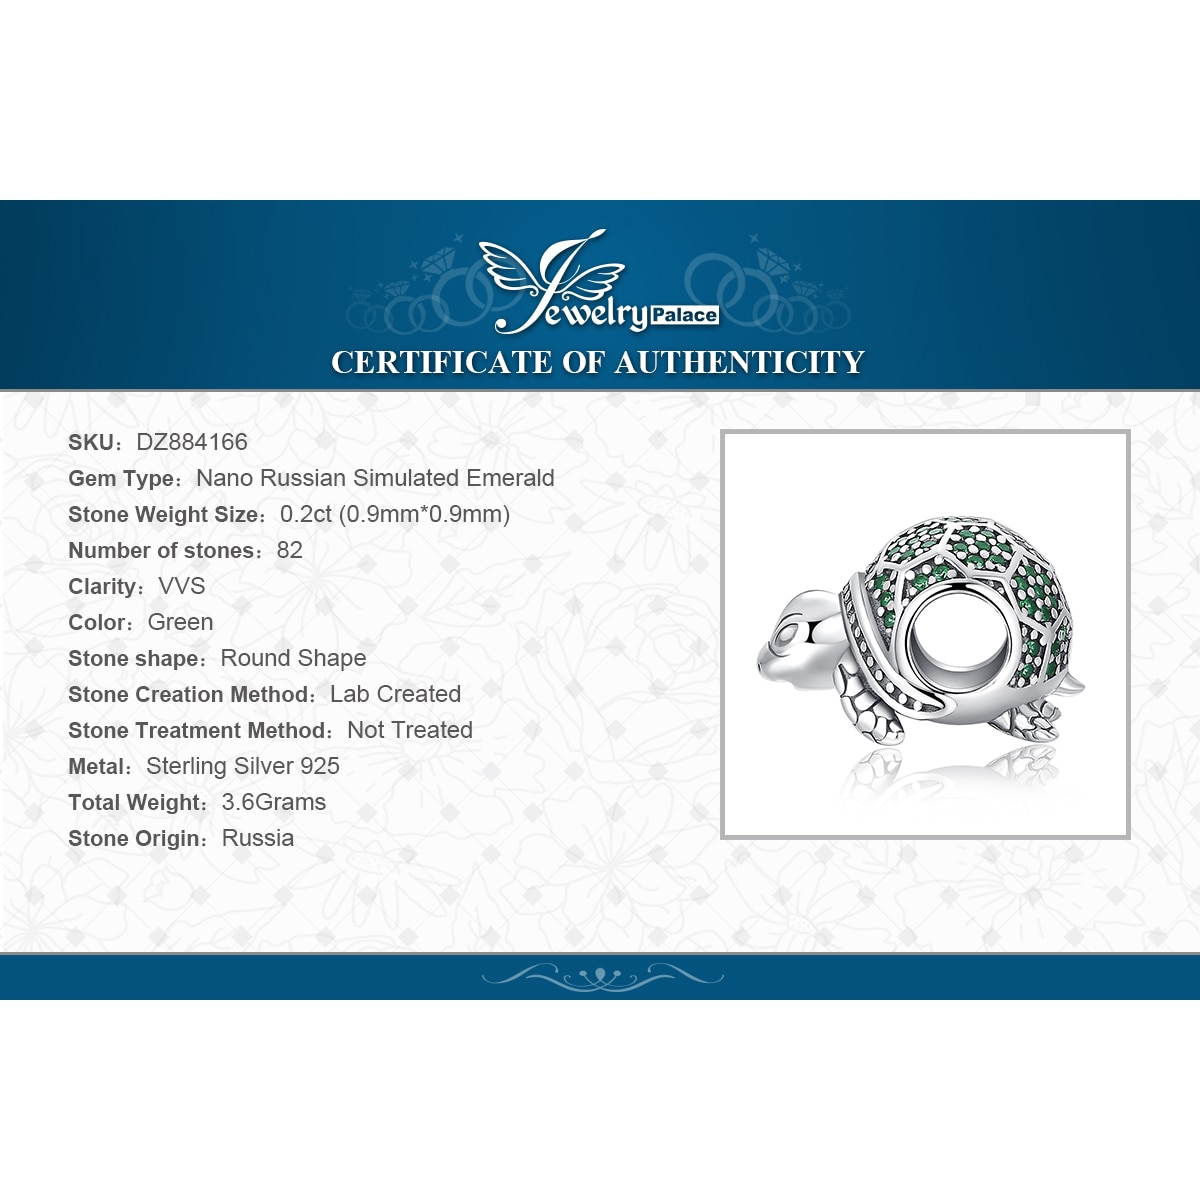 Купить с кэшбэком JewelryPalace Turtle 925 Sterling Silver Beads Charms Silver 925 Original For Bracelet Silver 925 original Beads Jewelry Making